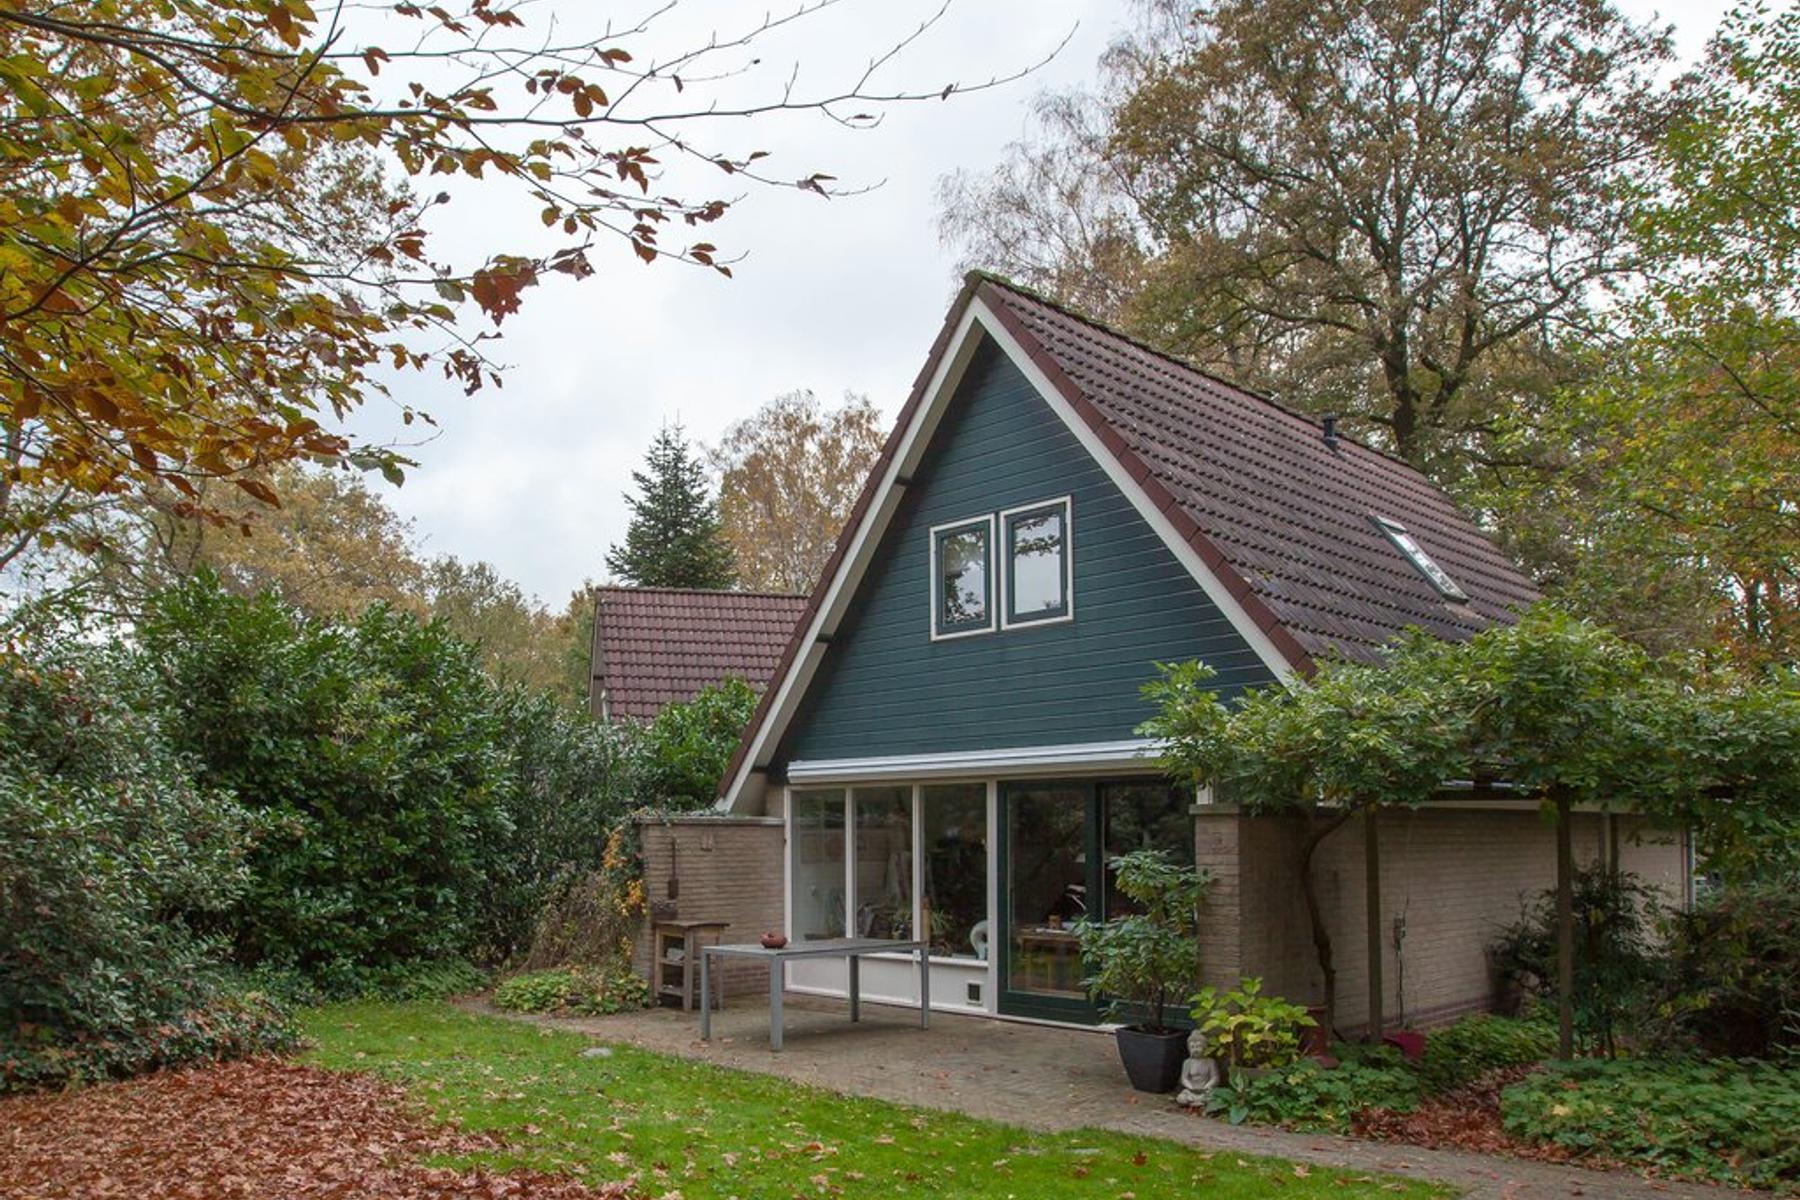 Vredenseweg 148 33 in Winterswijk Henxel 7113 AE